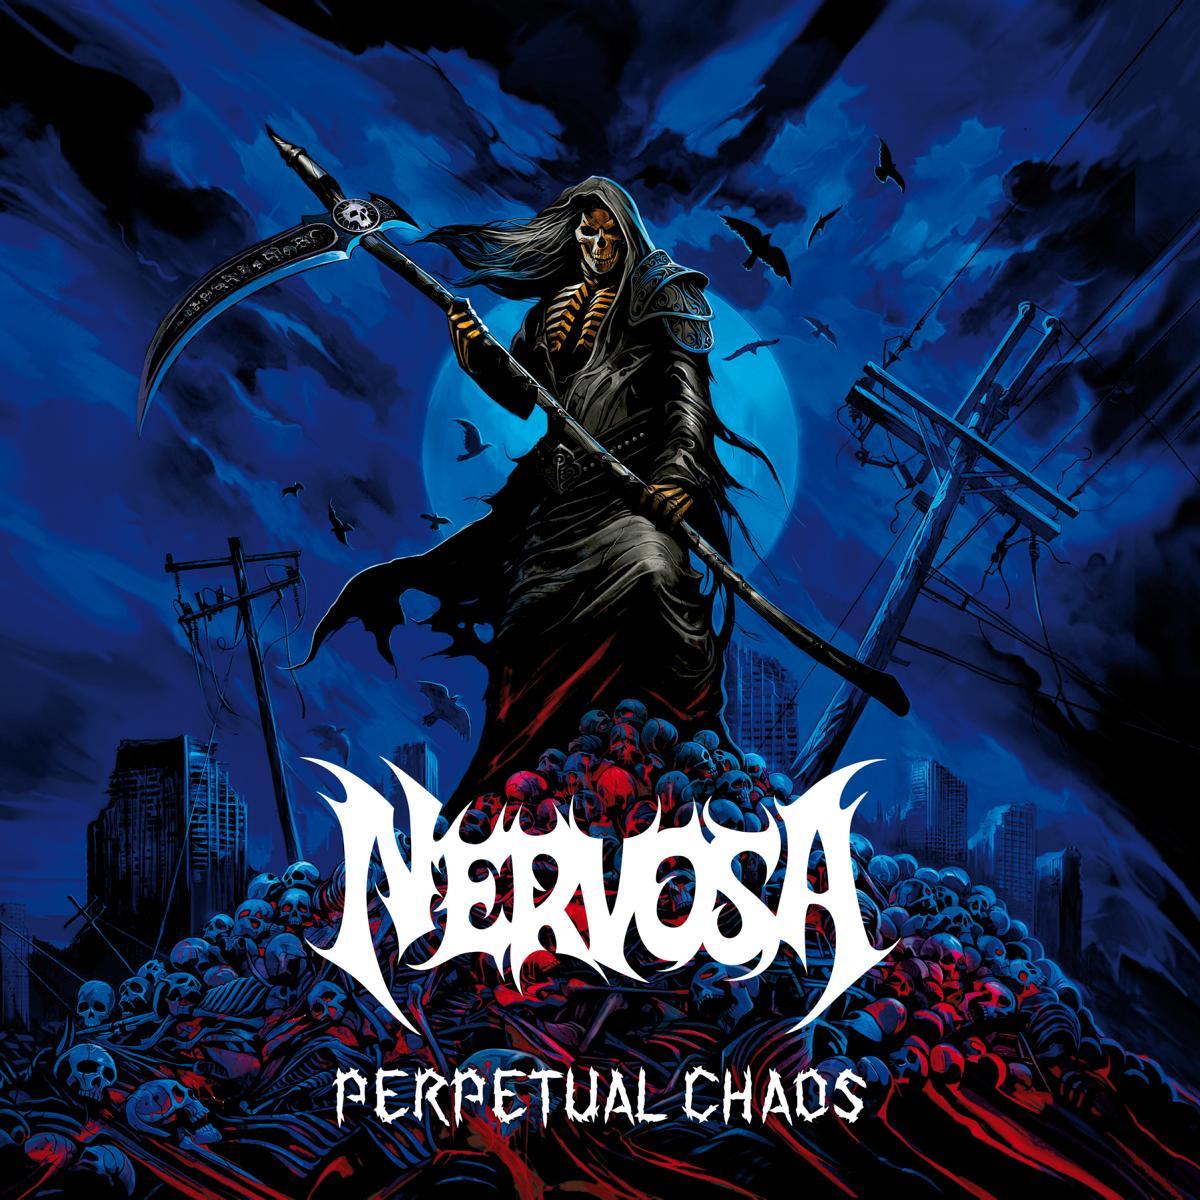 nervosa perpetual chaos album cover